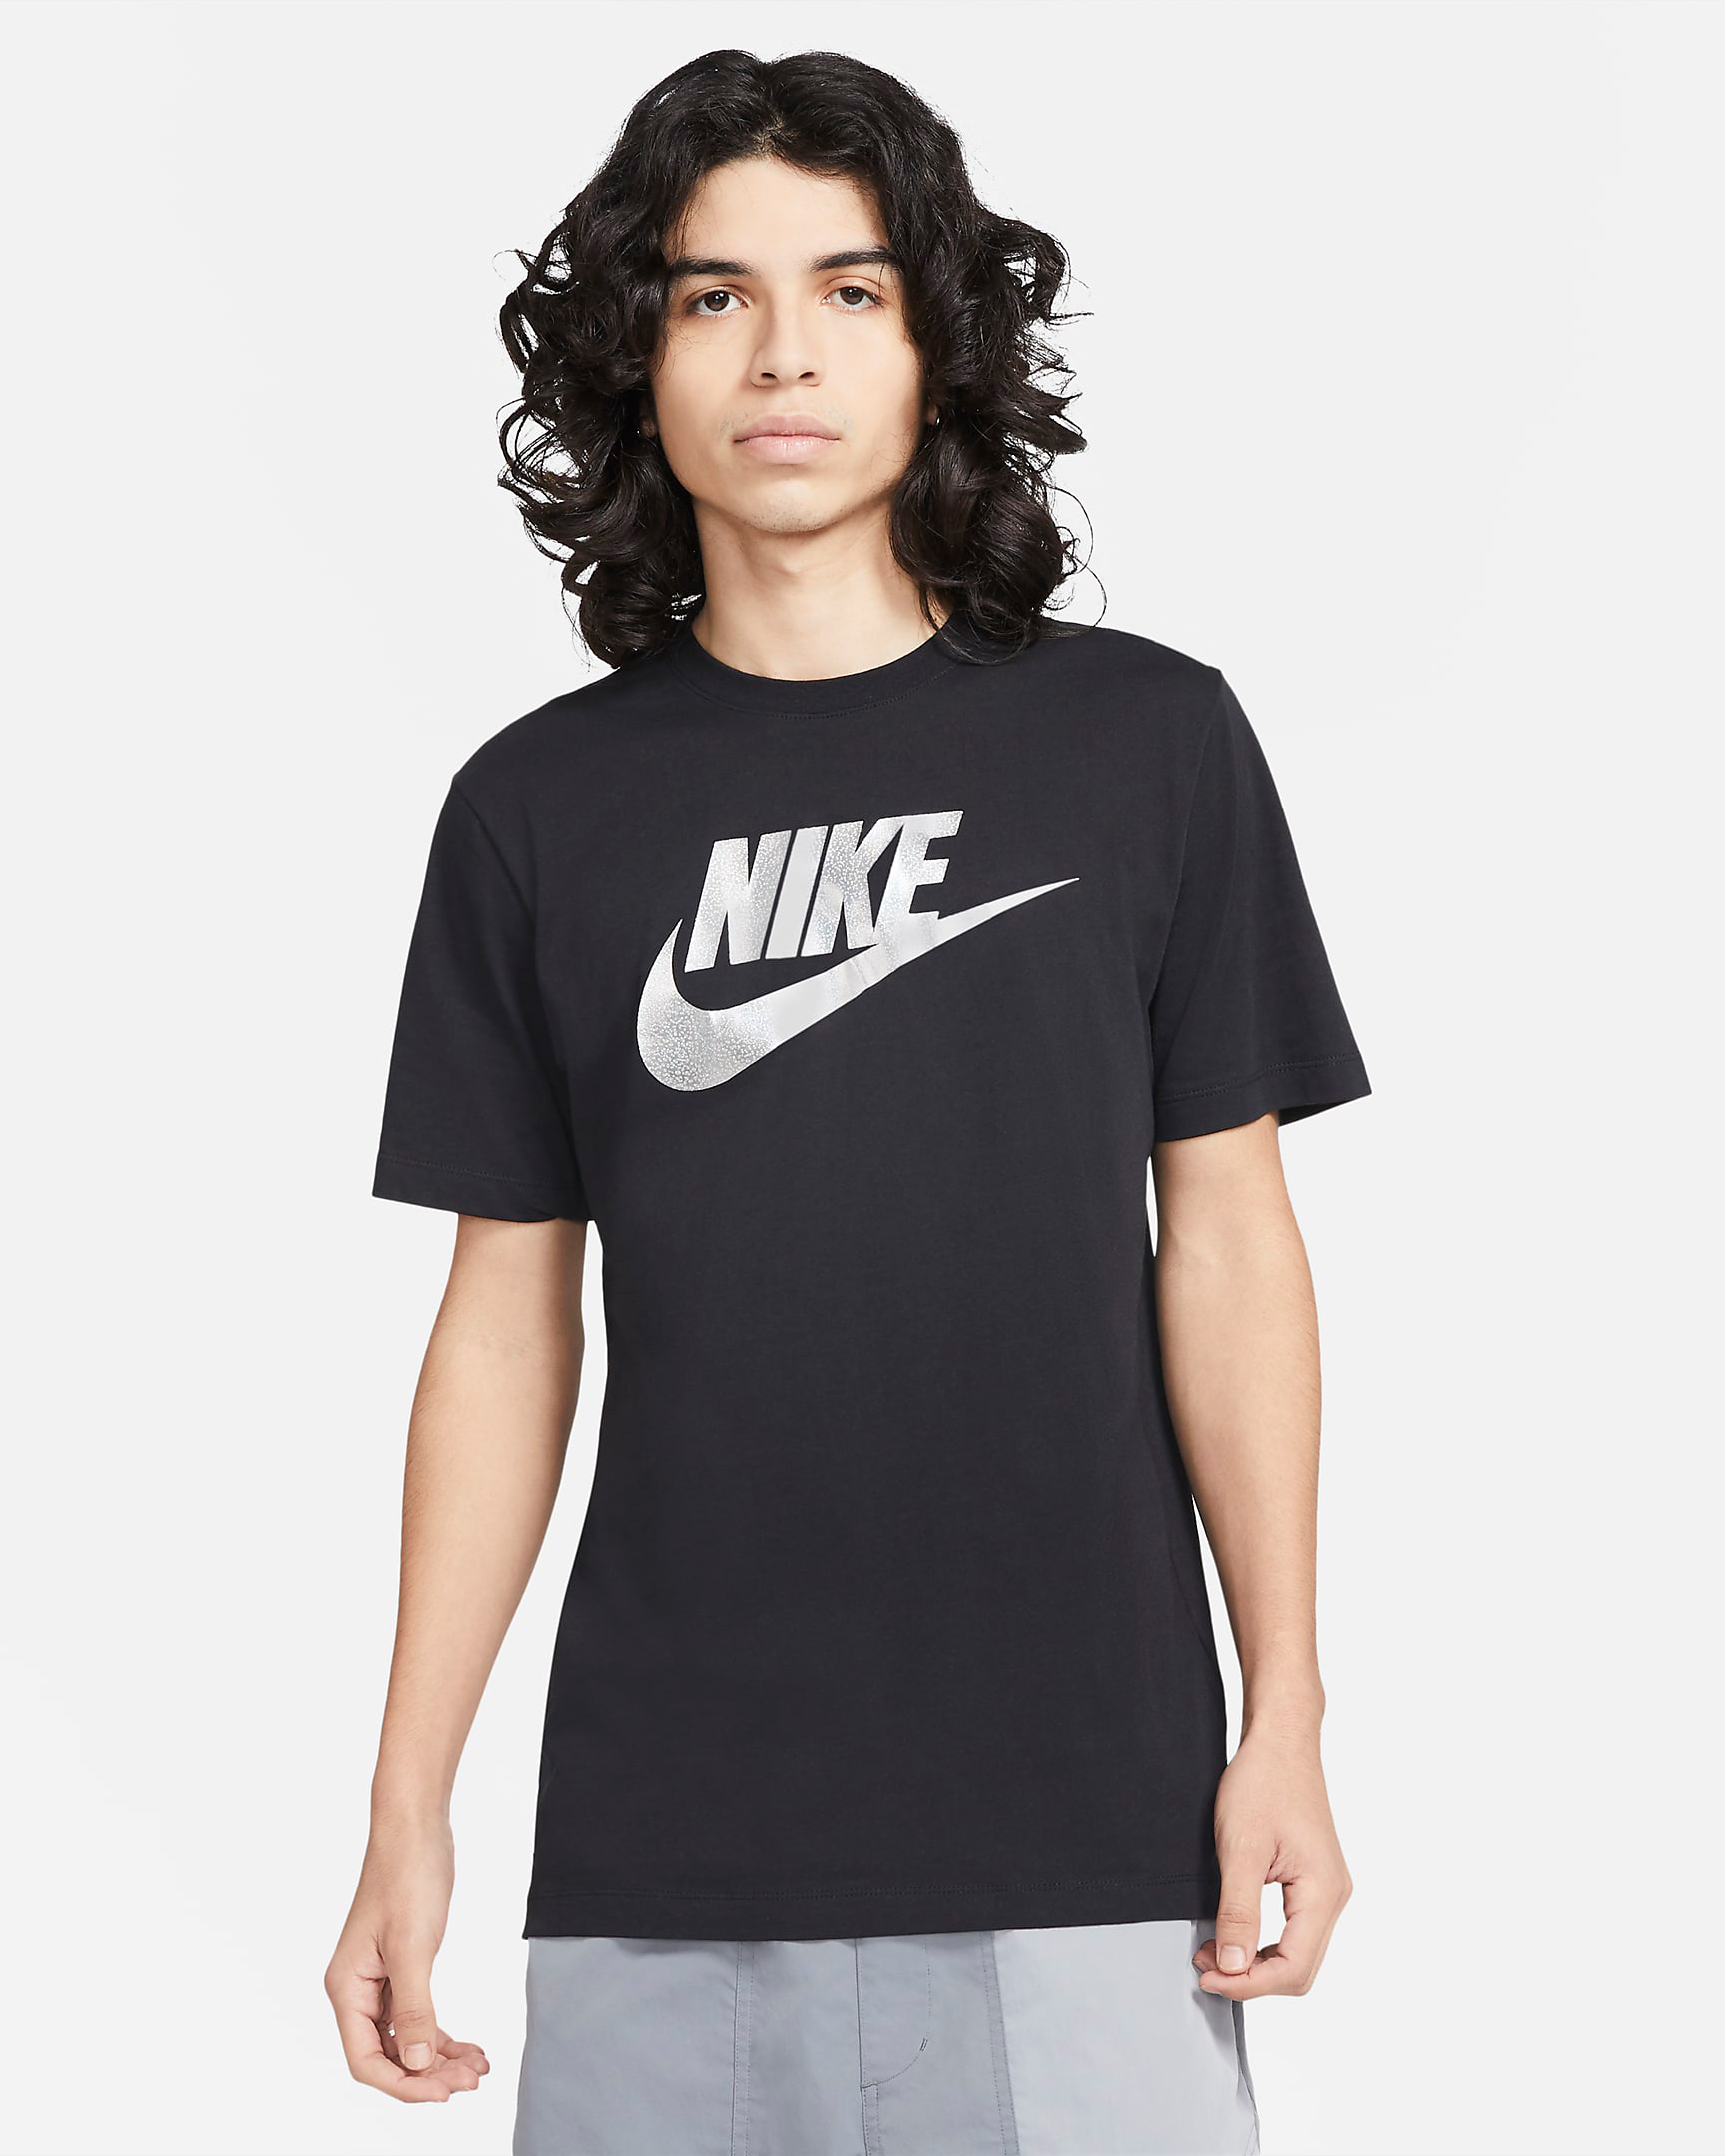 nike-sportswear-metallic-silver-black-2